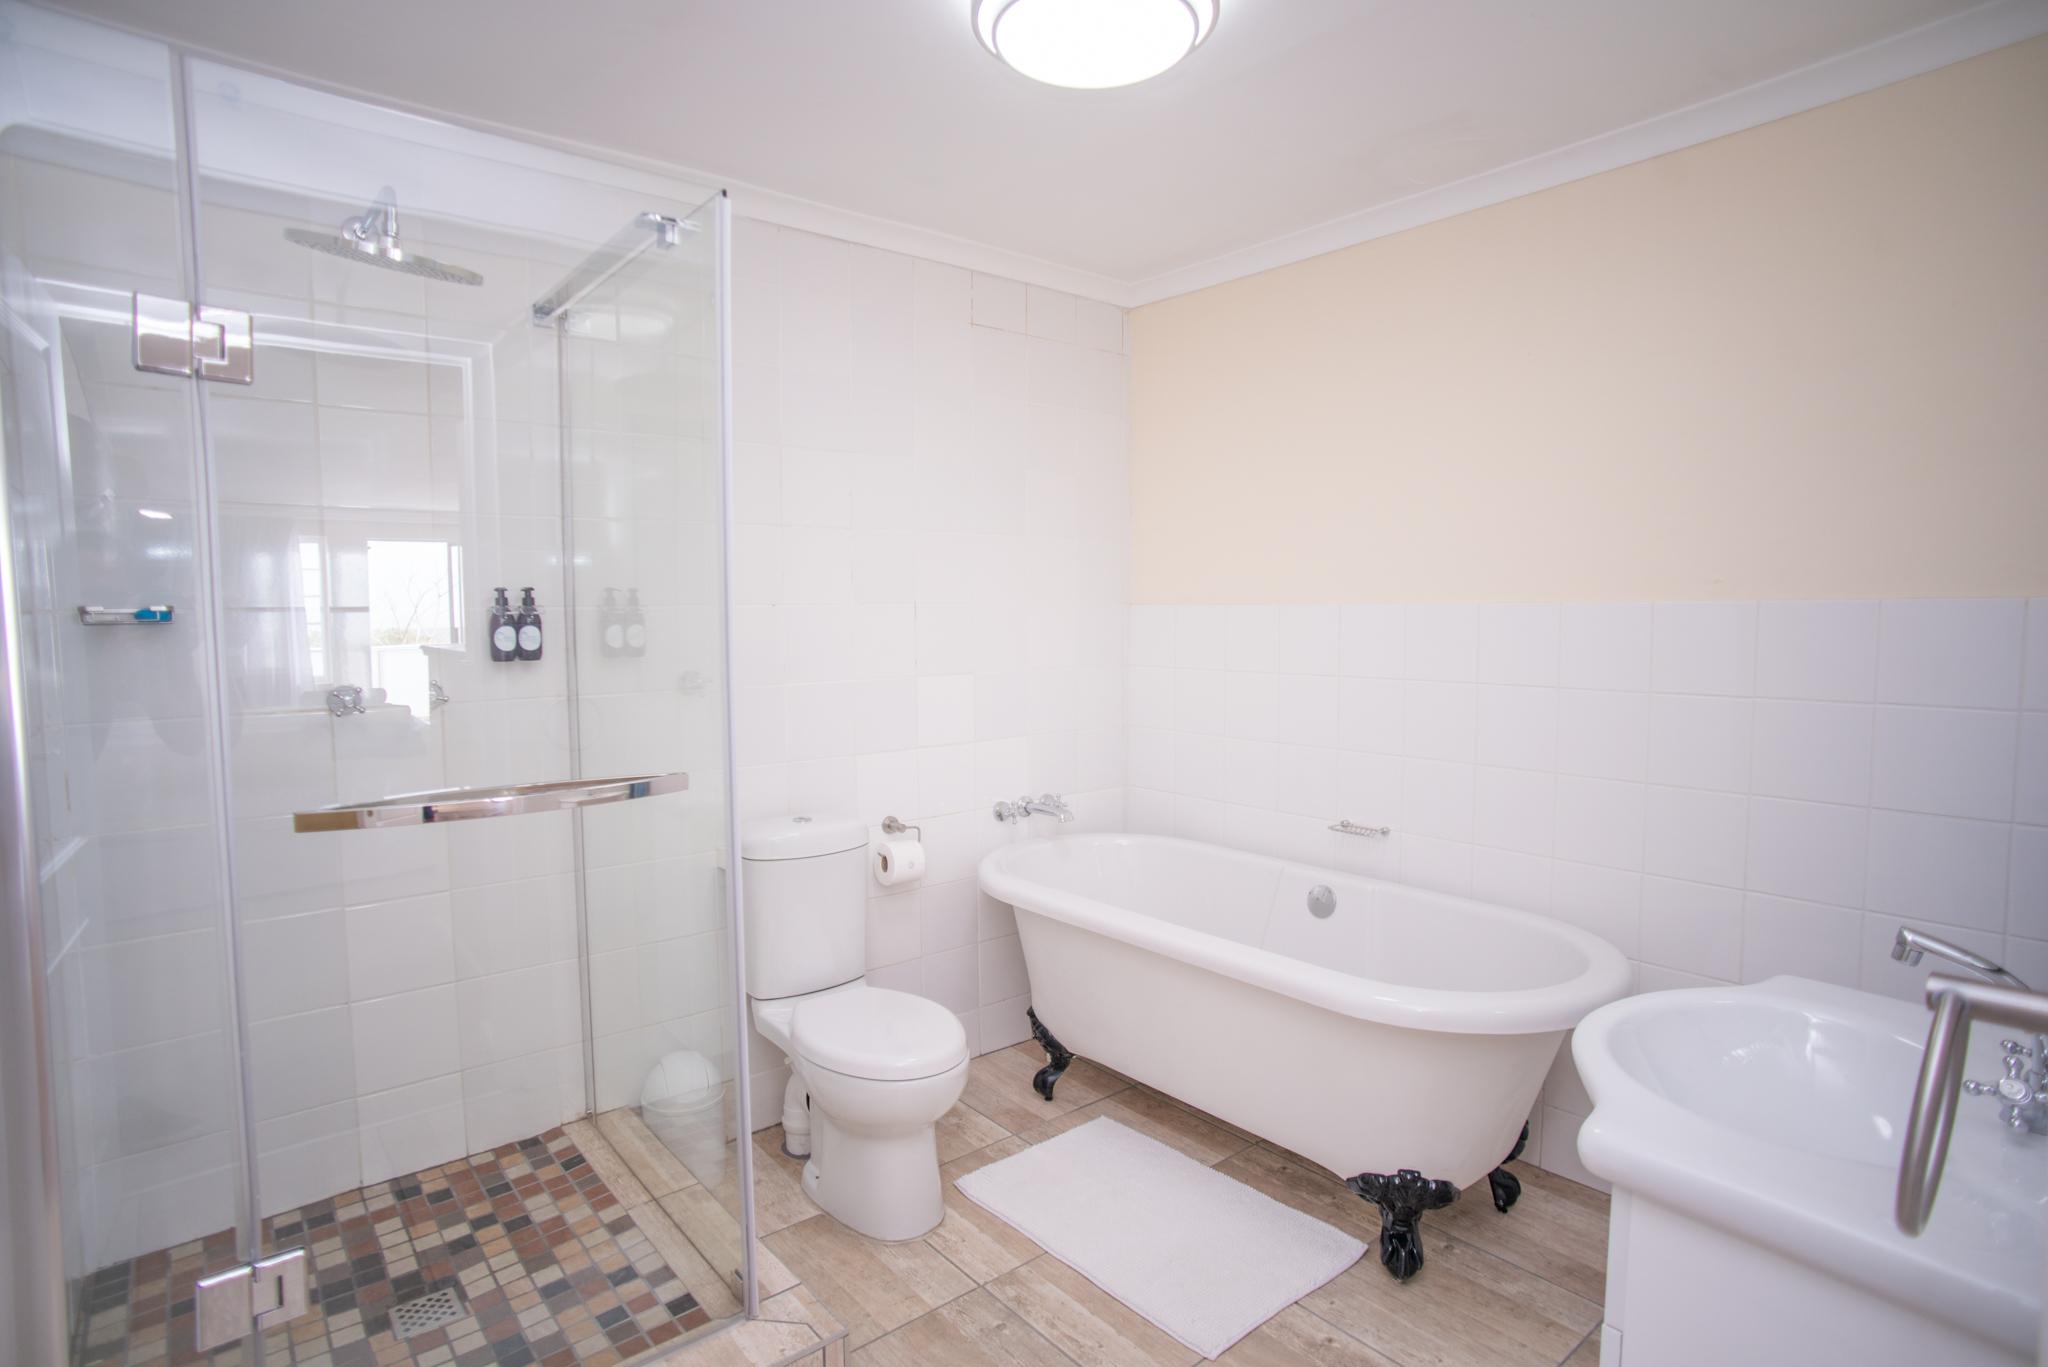 Olivers Bed & Breakfast - Tristen Bathroom